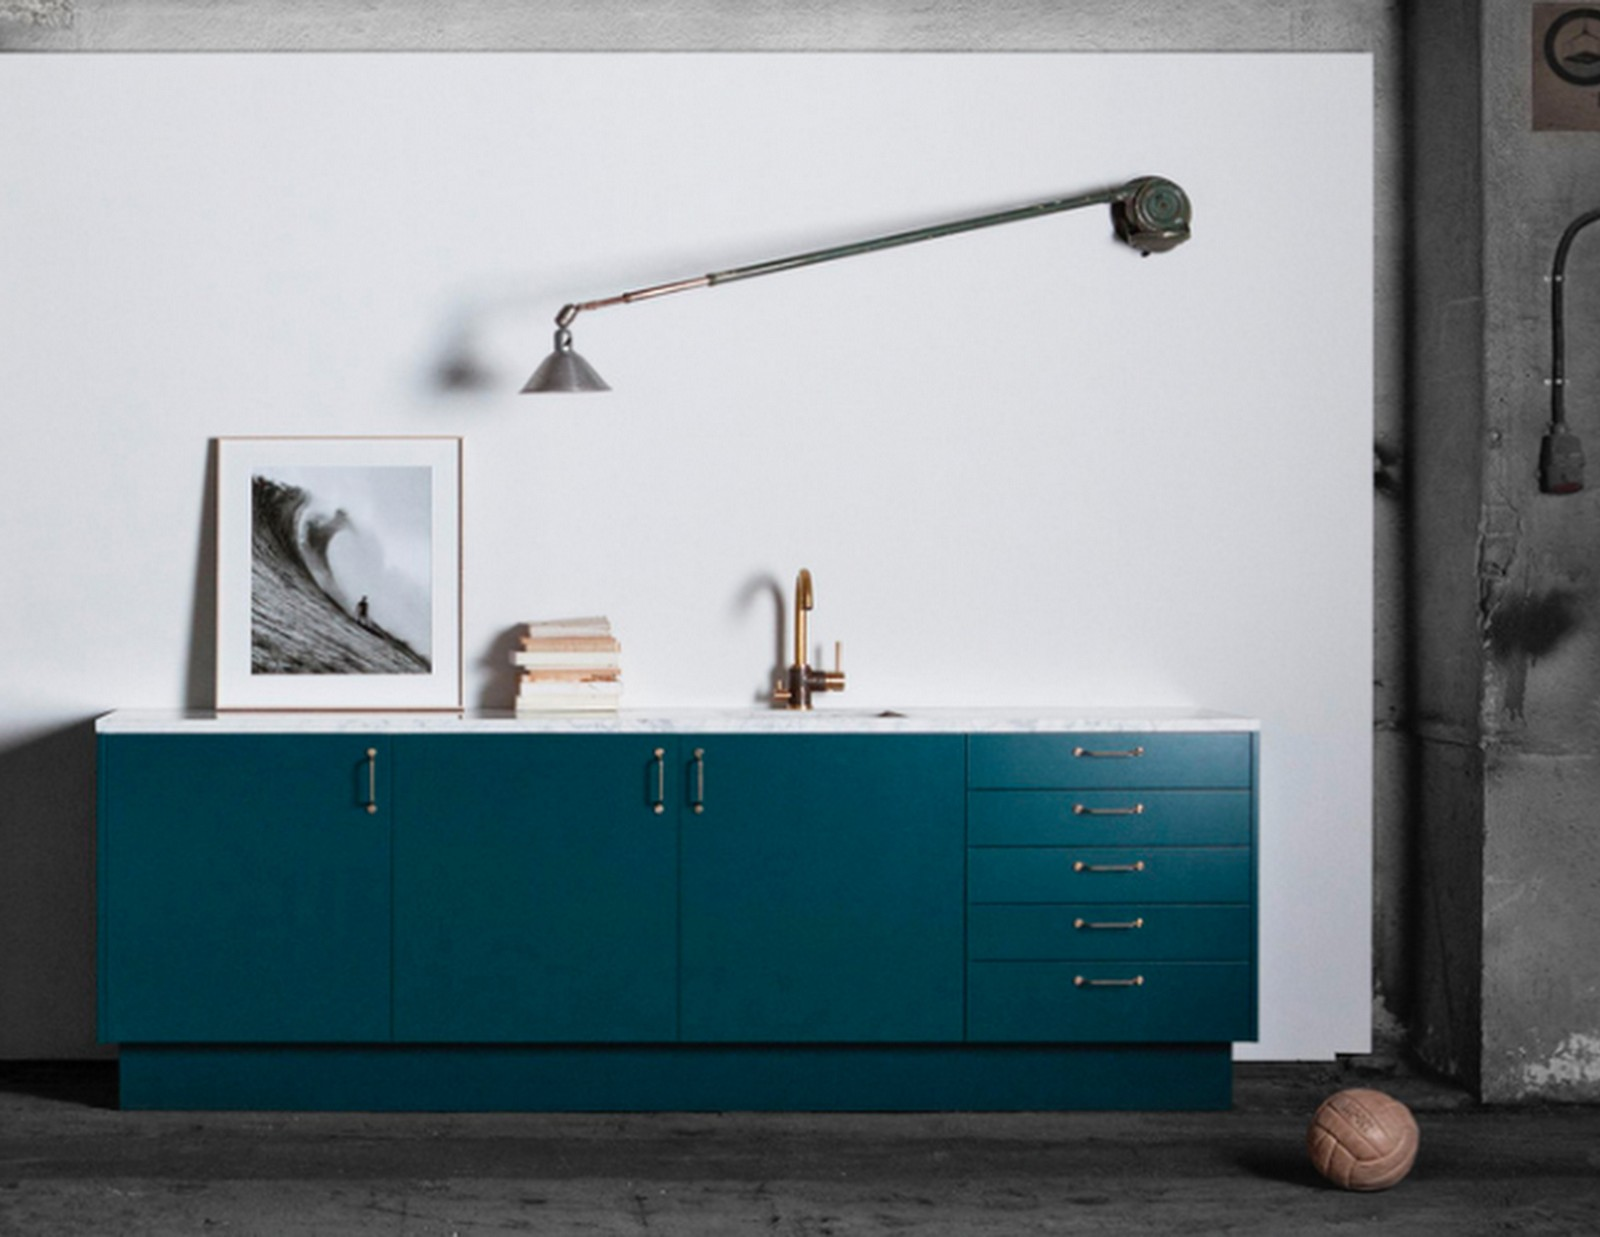 Jade Green Kitchen | House of Valentina